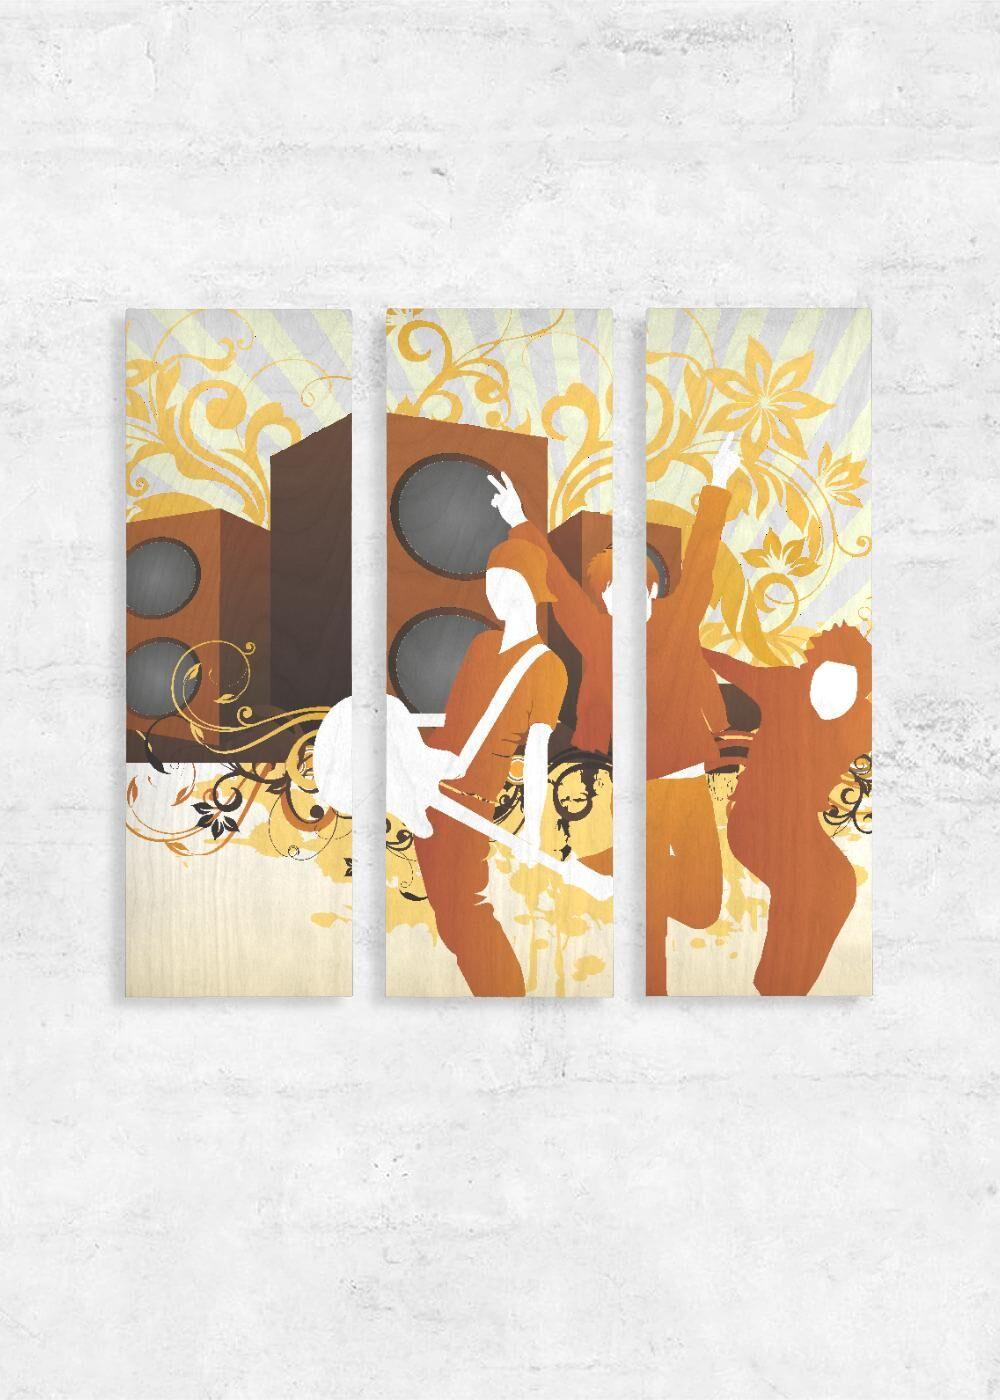 VIDA Wood Wall Art - Set of 3 - Music Background by VIDA Original Artist  - Size: One Size